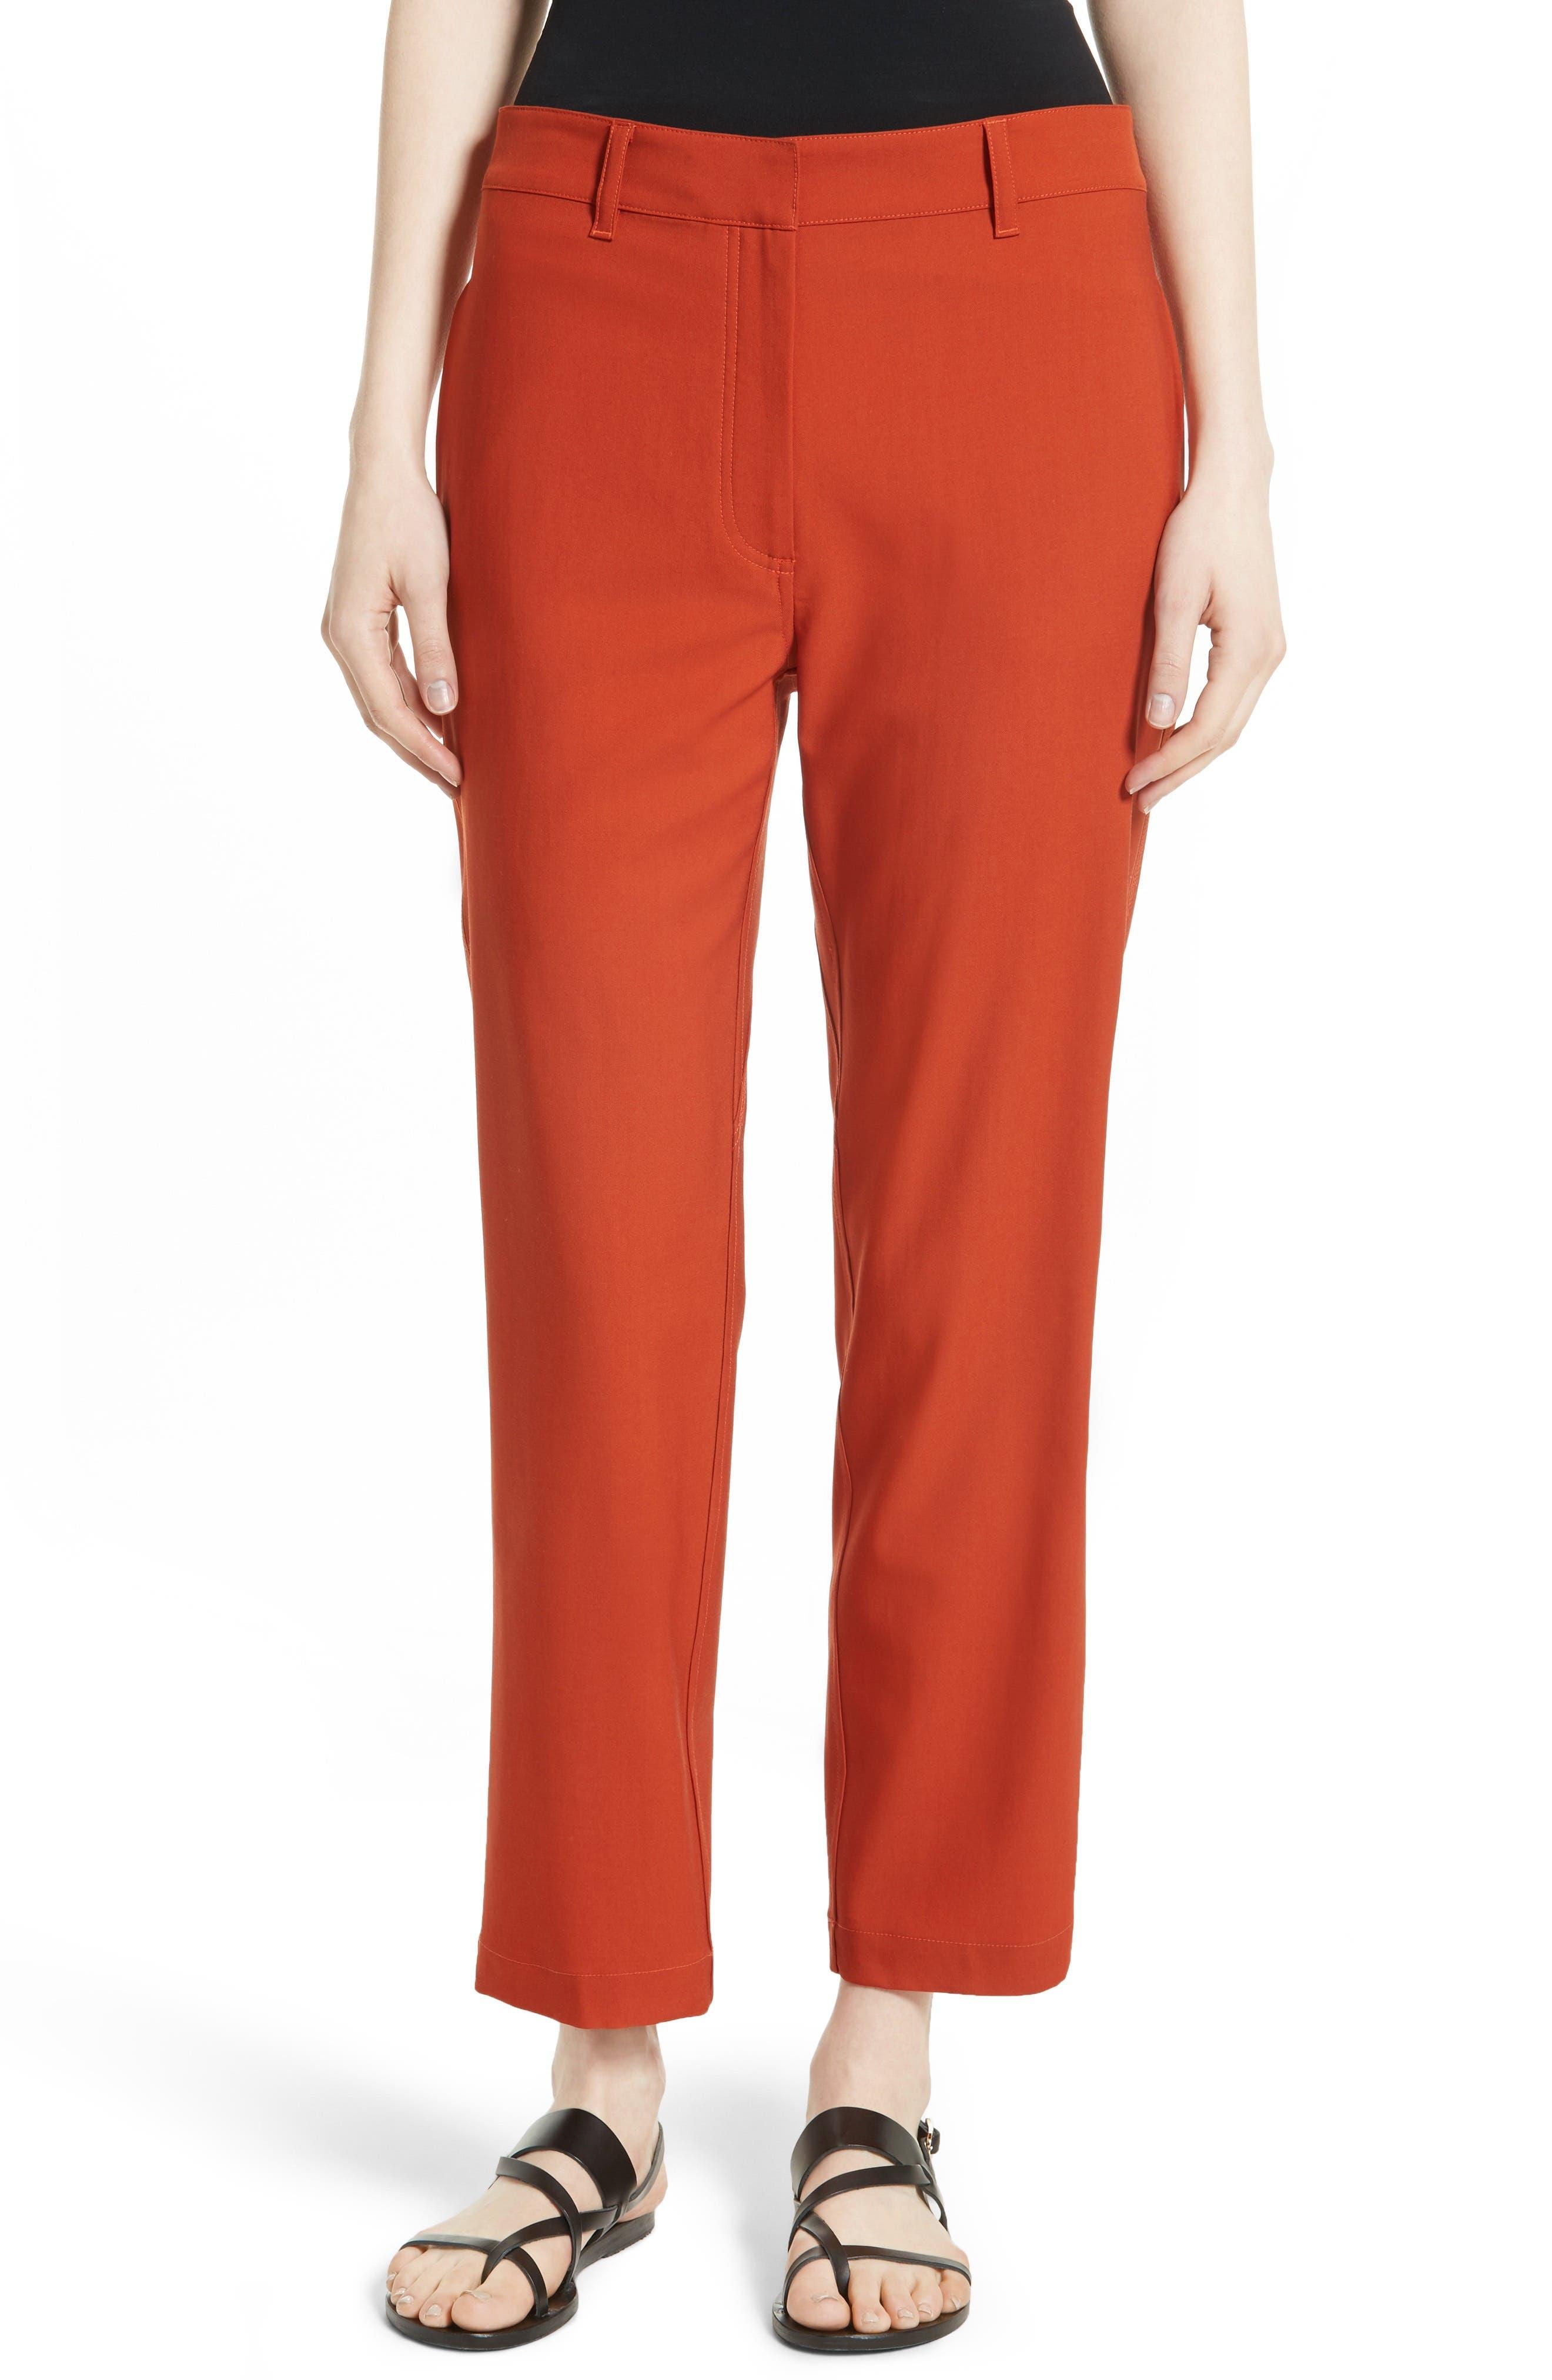 Thorelle B New Stretch Wool Pants,                             Main thumbnail 1, color,                             837